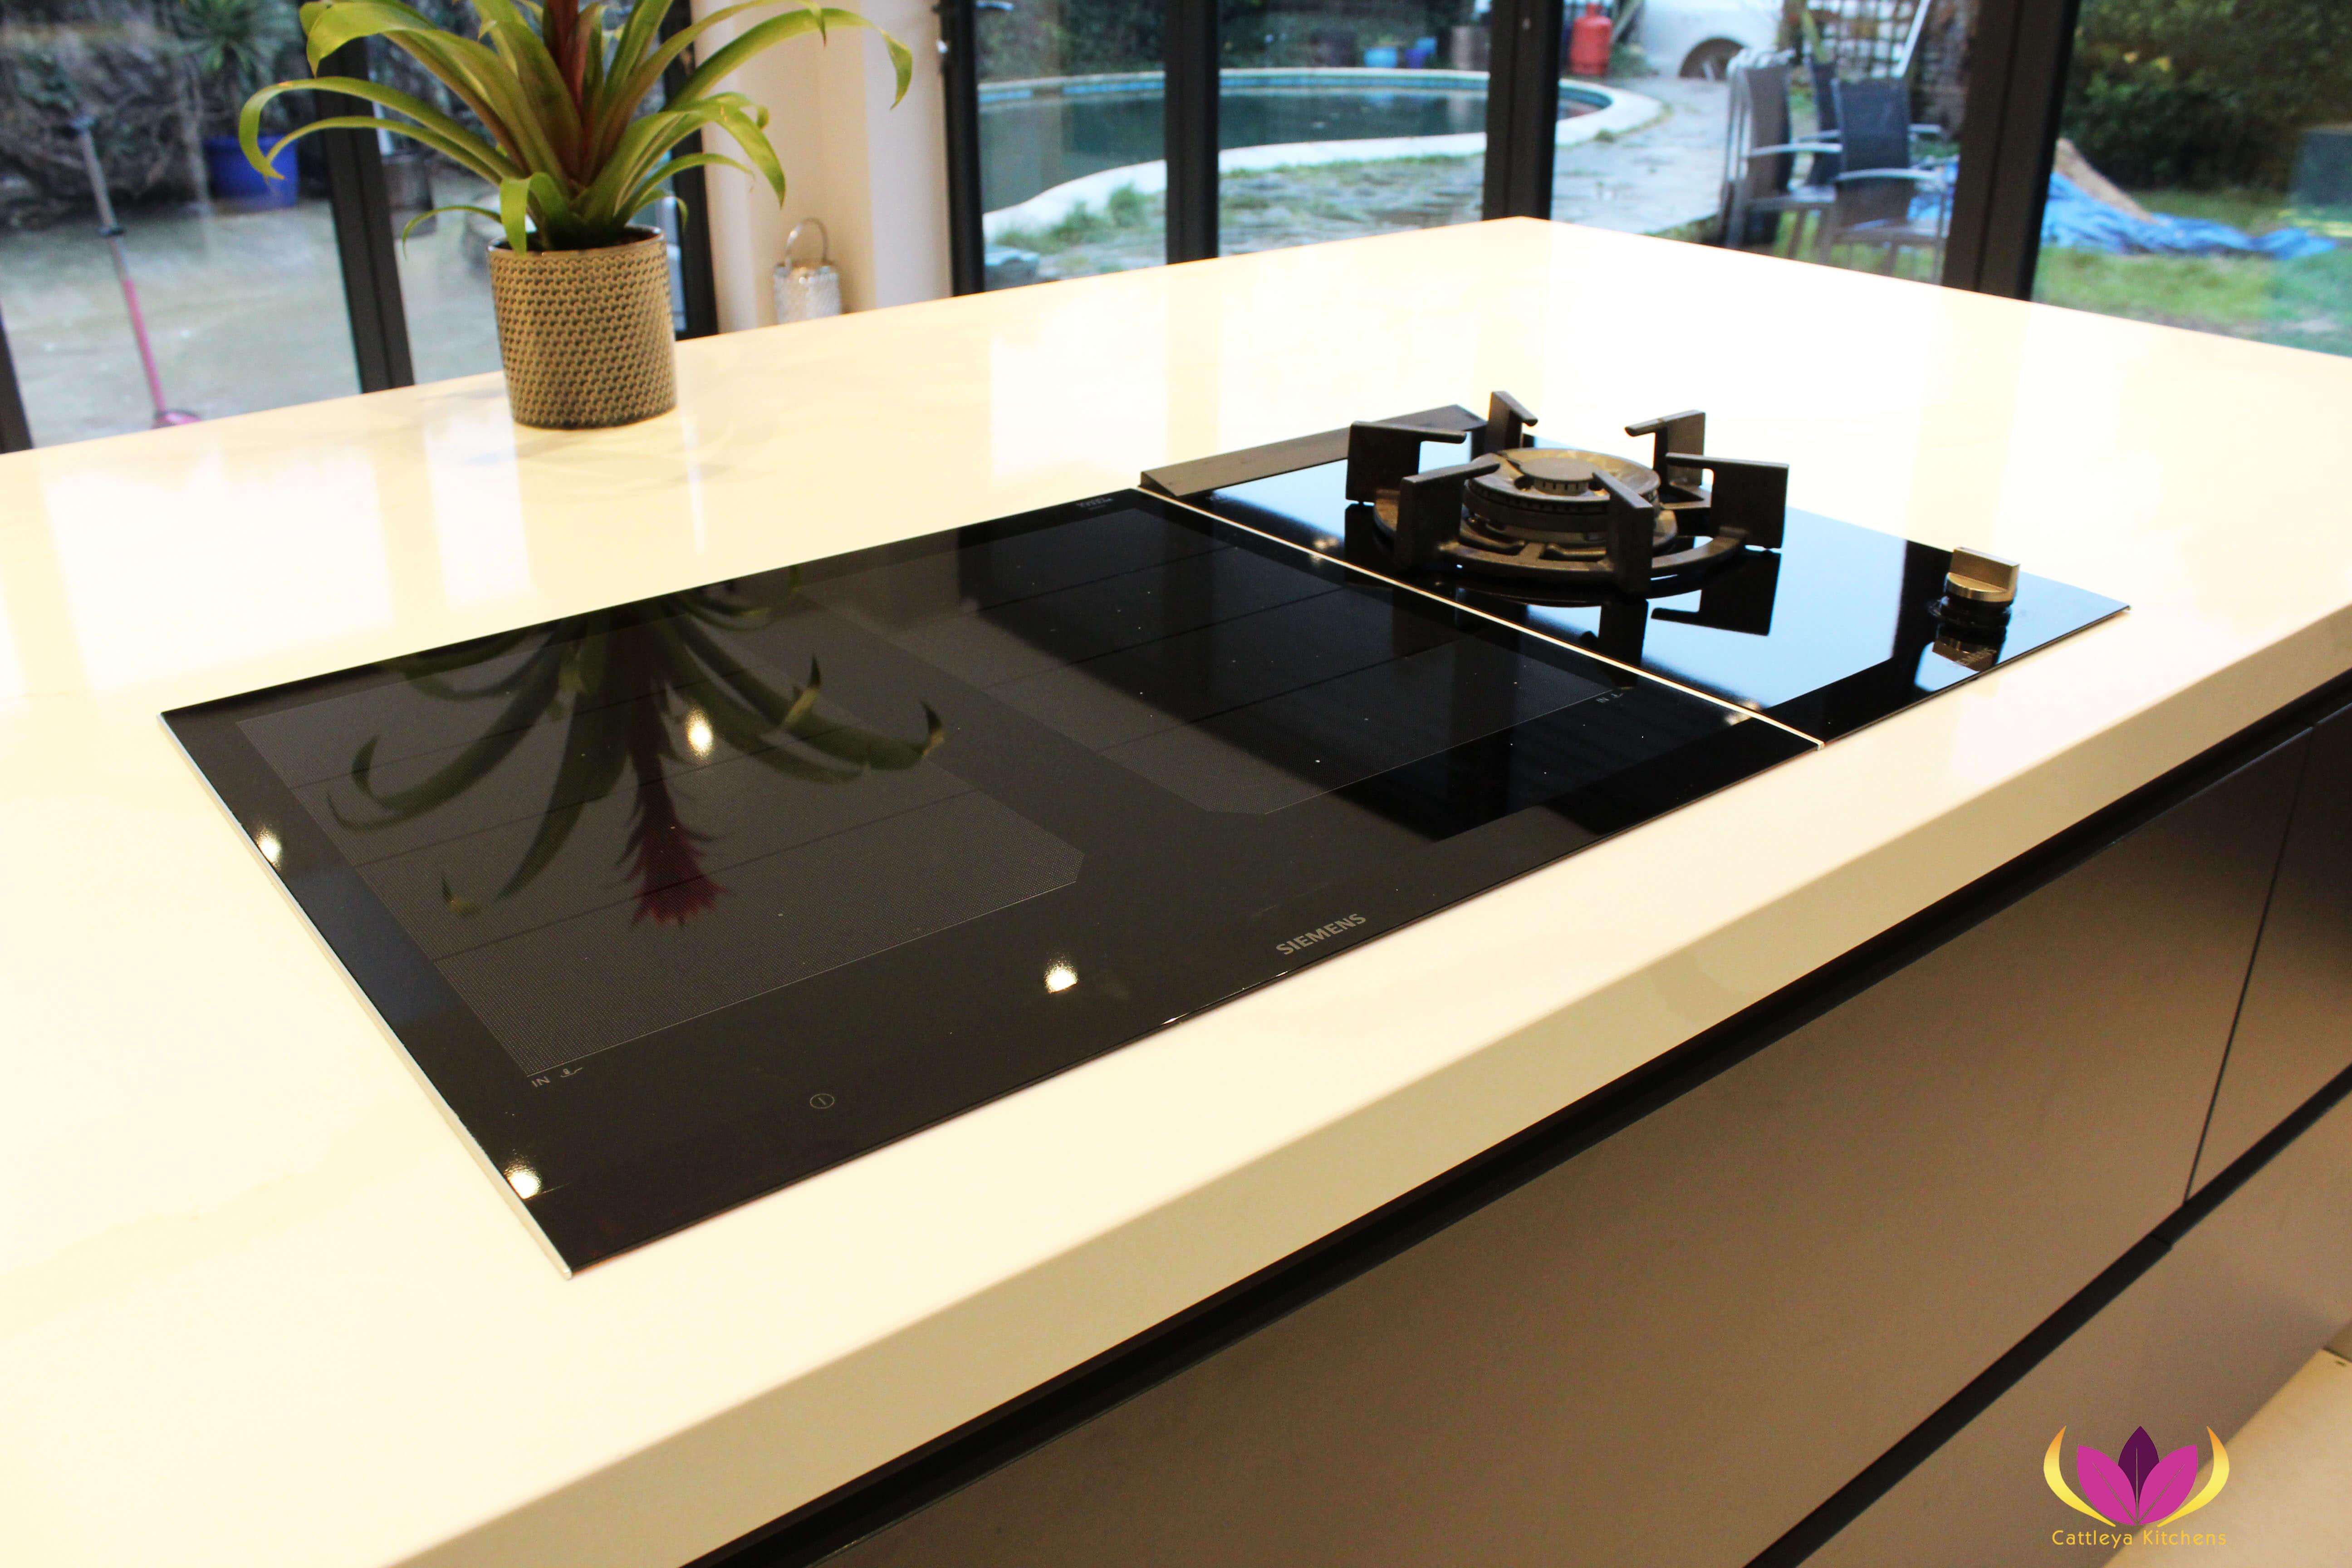 Siemens induction hob & gas hob - Twickenham Finished Kitchen Project